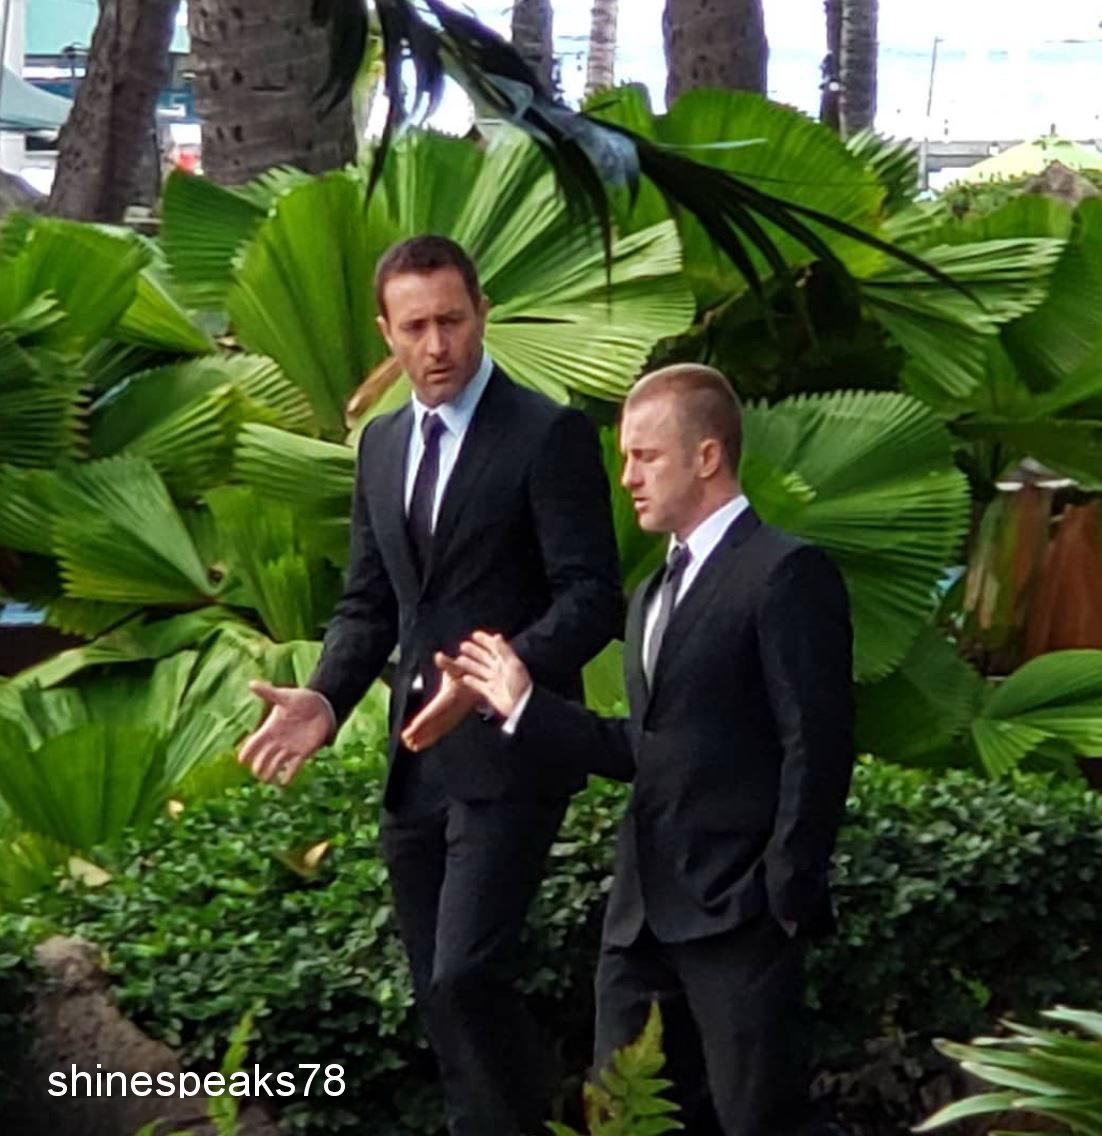 Hawaii Five-0 - BTS Episode 9.18 Twitter/IG/FB Summary